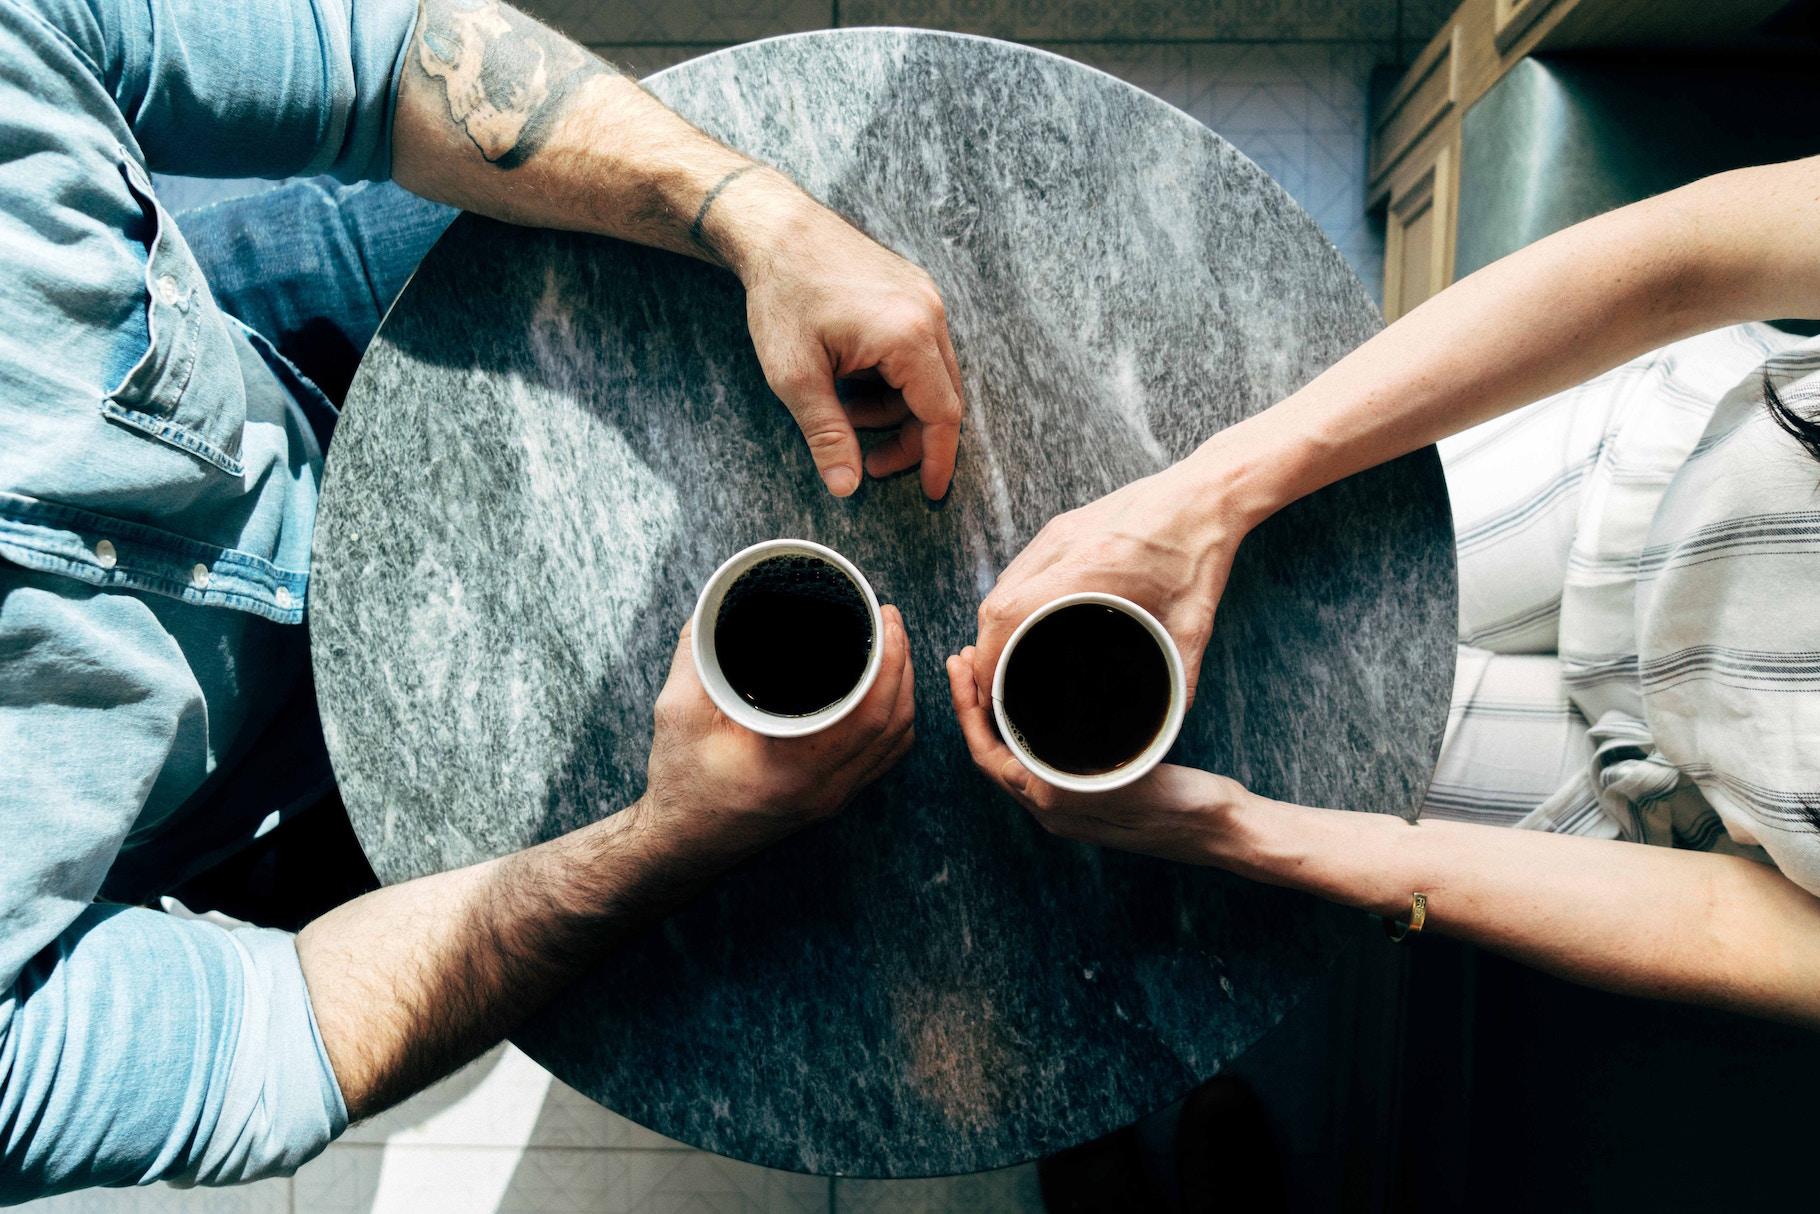 How Do I Make My Relationship Work